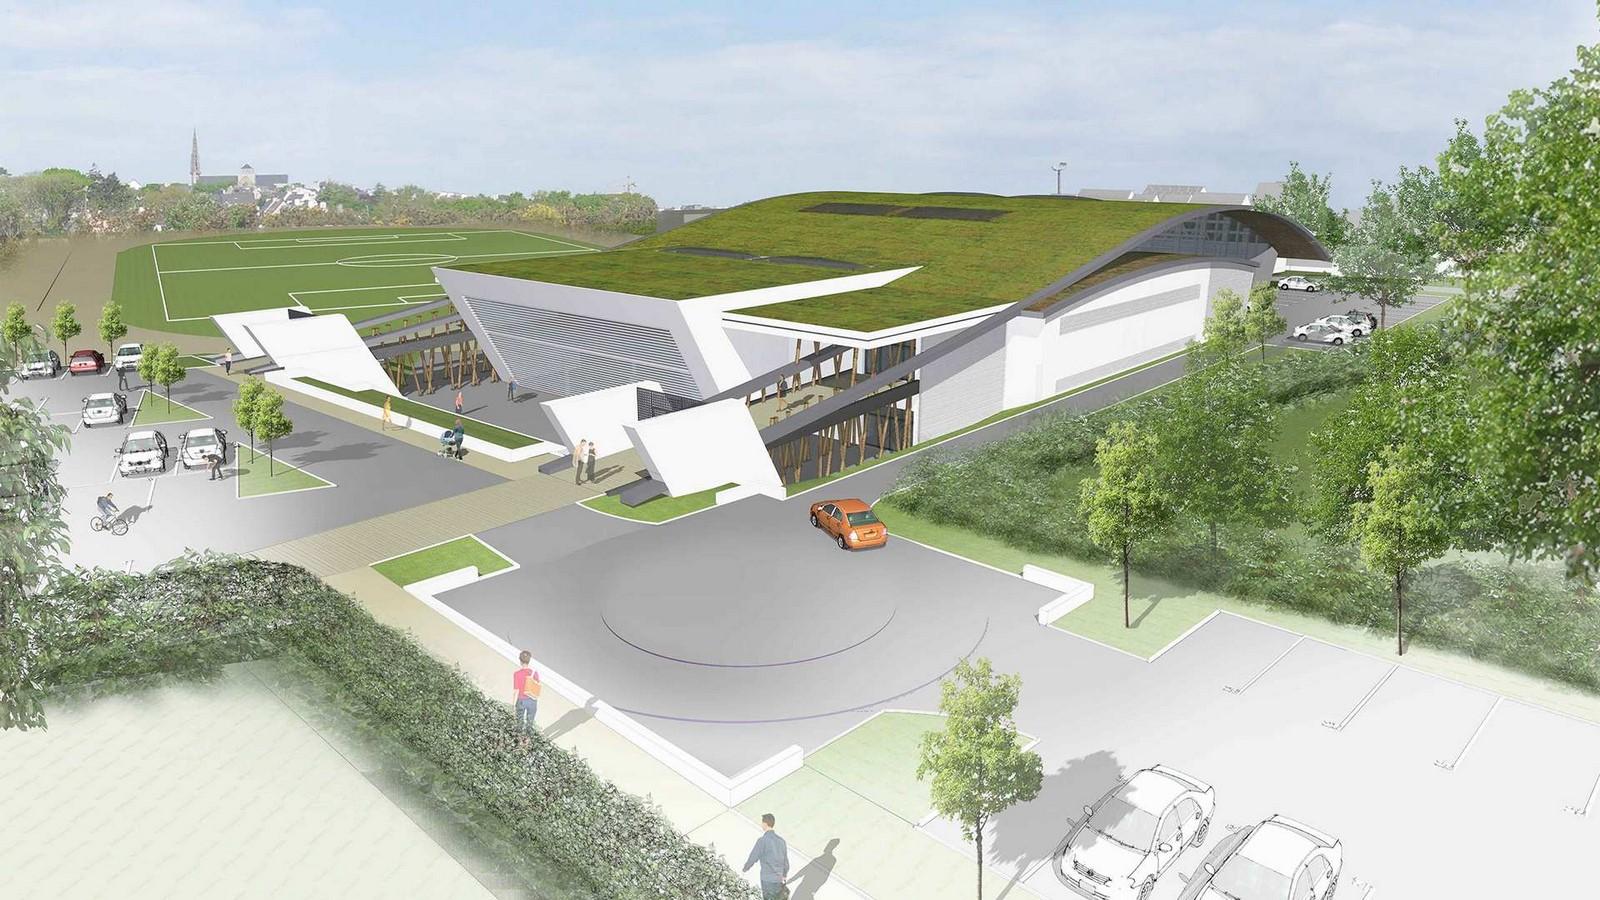 Architects in Brest - Top 30 Architects in Brest - Sheet22